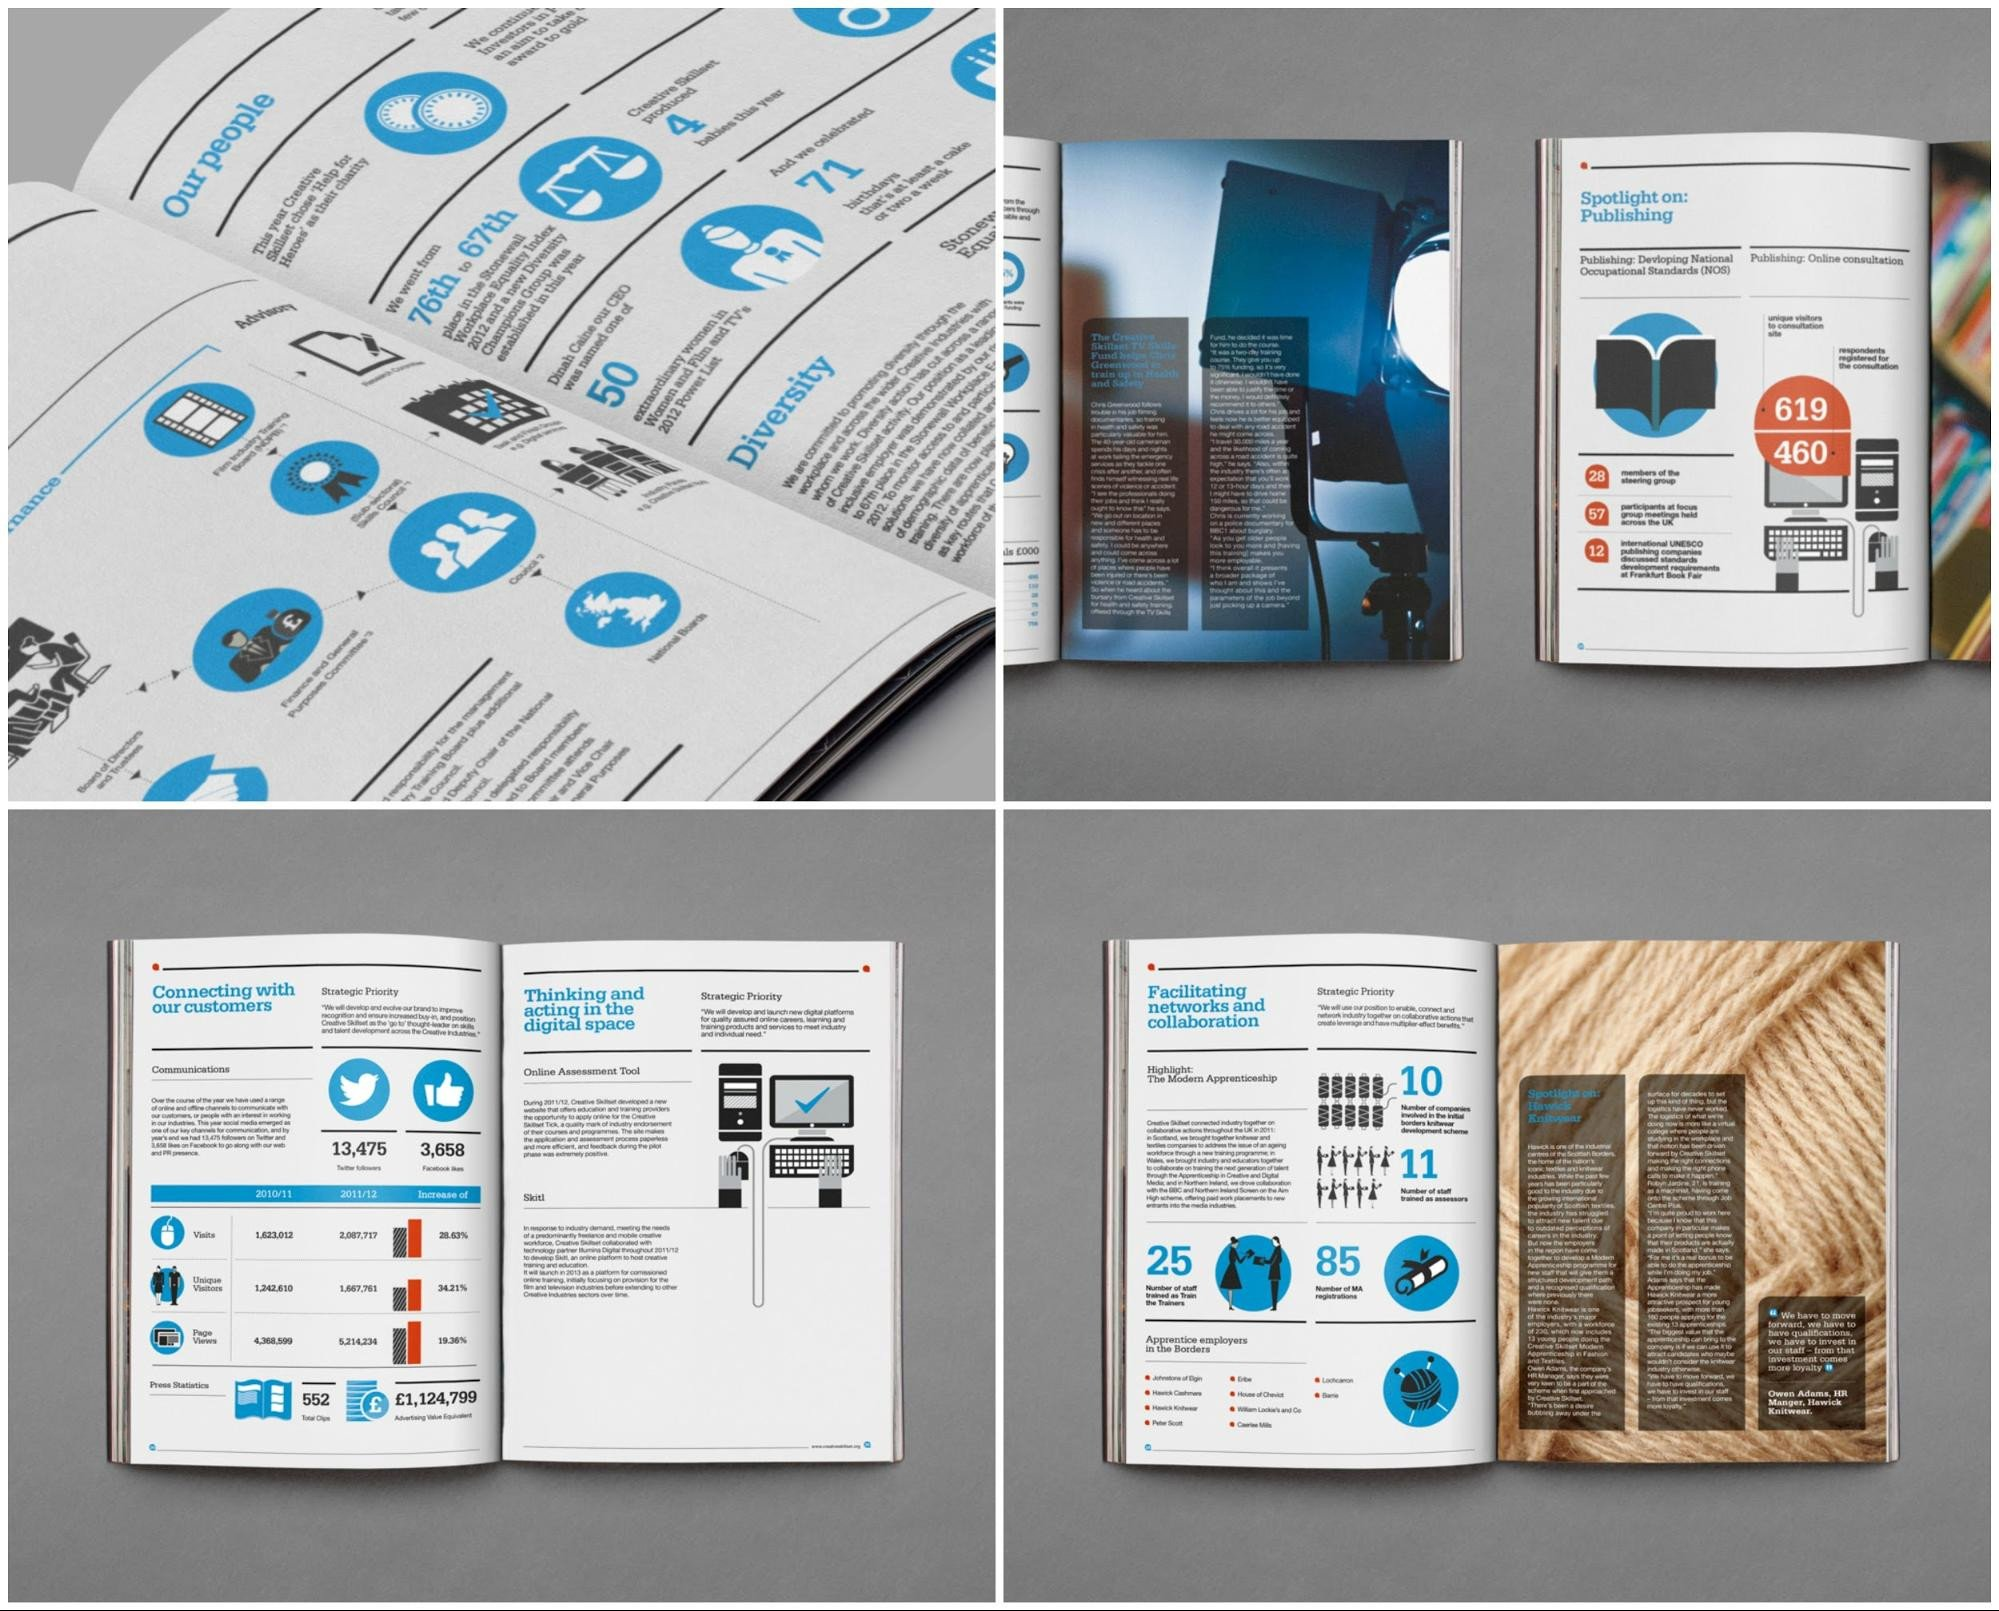 Annual Report Design Templates 55 Customizable Annual Report Templates Examples & Tips